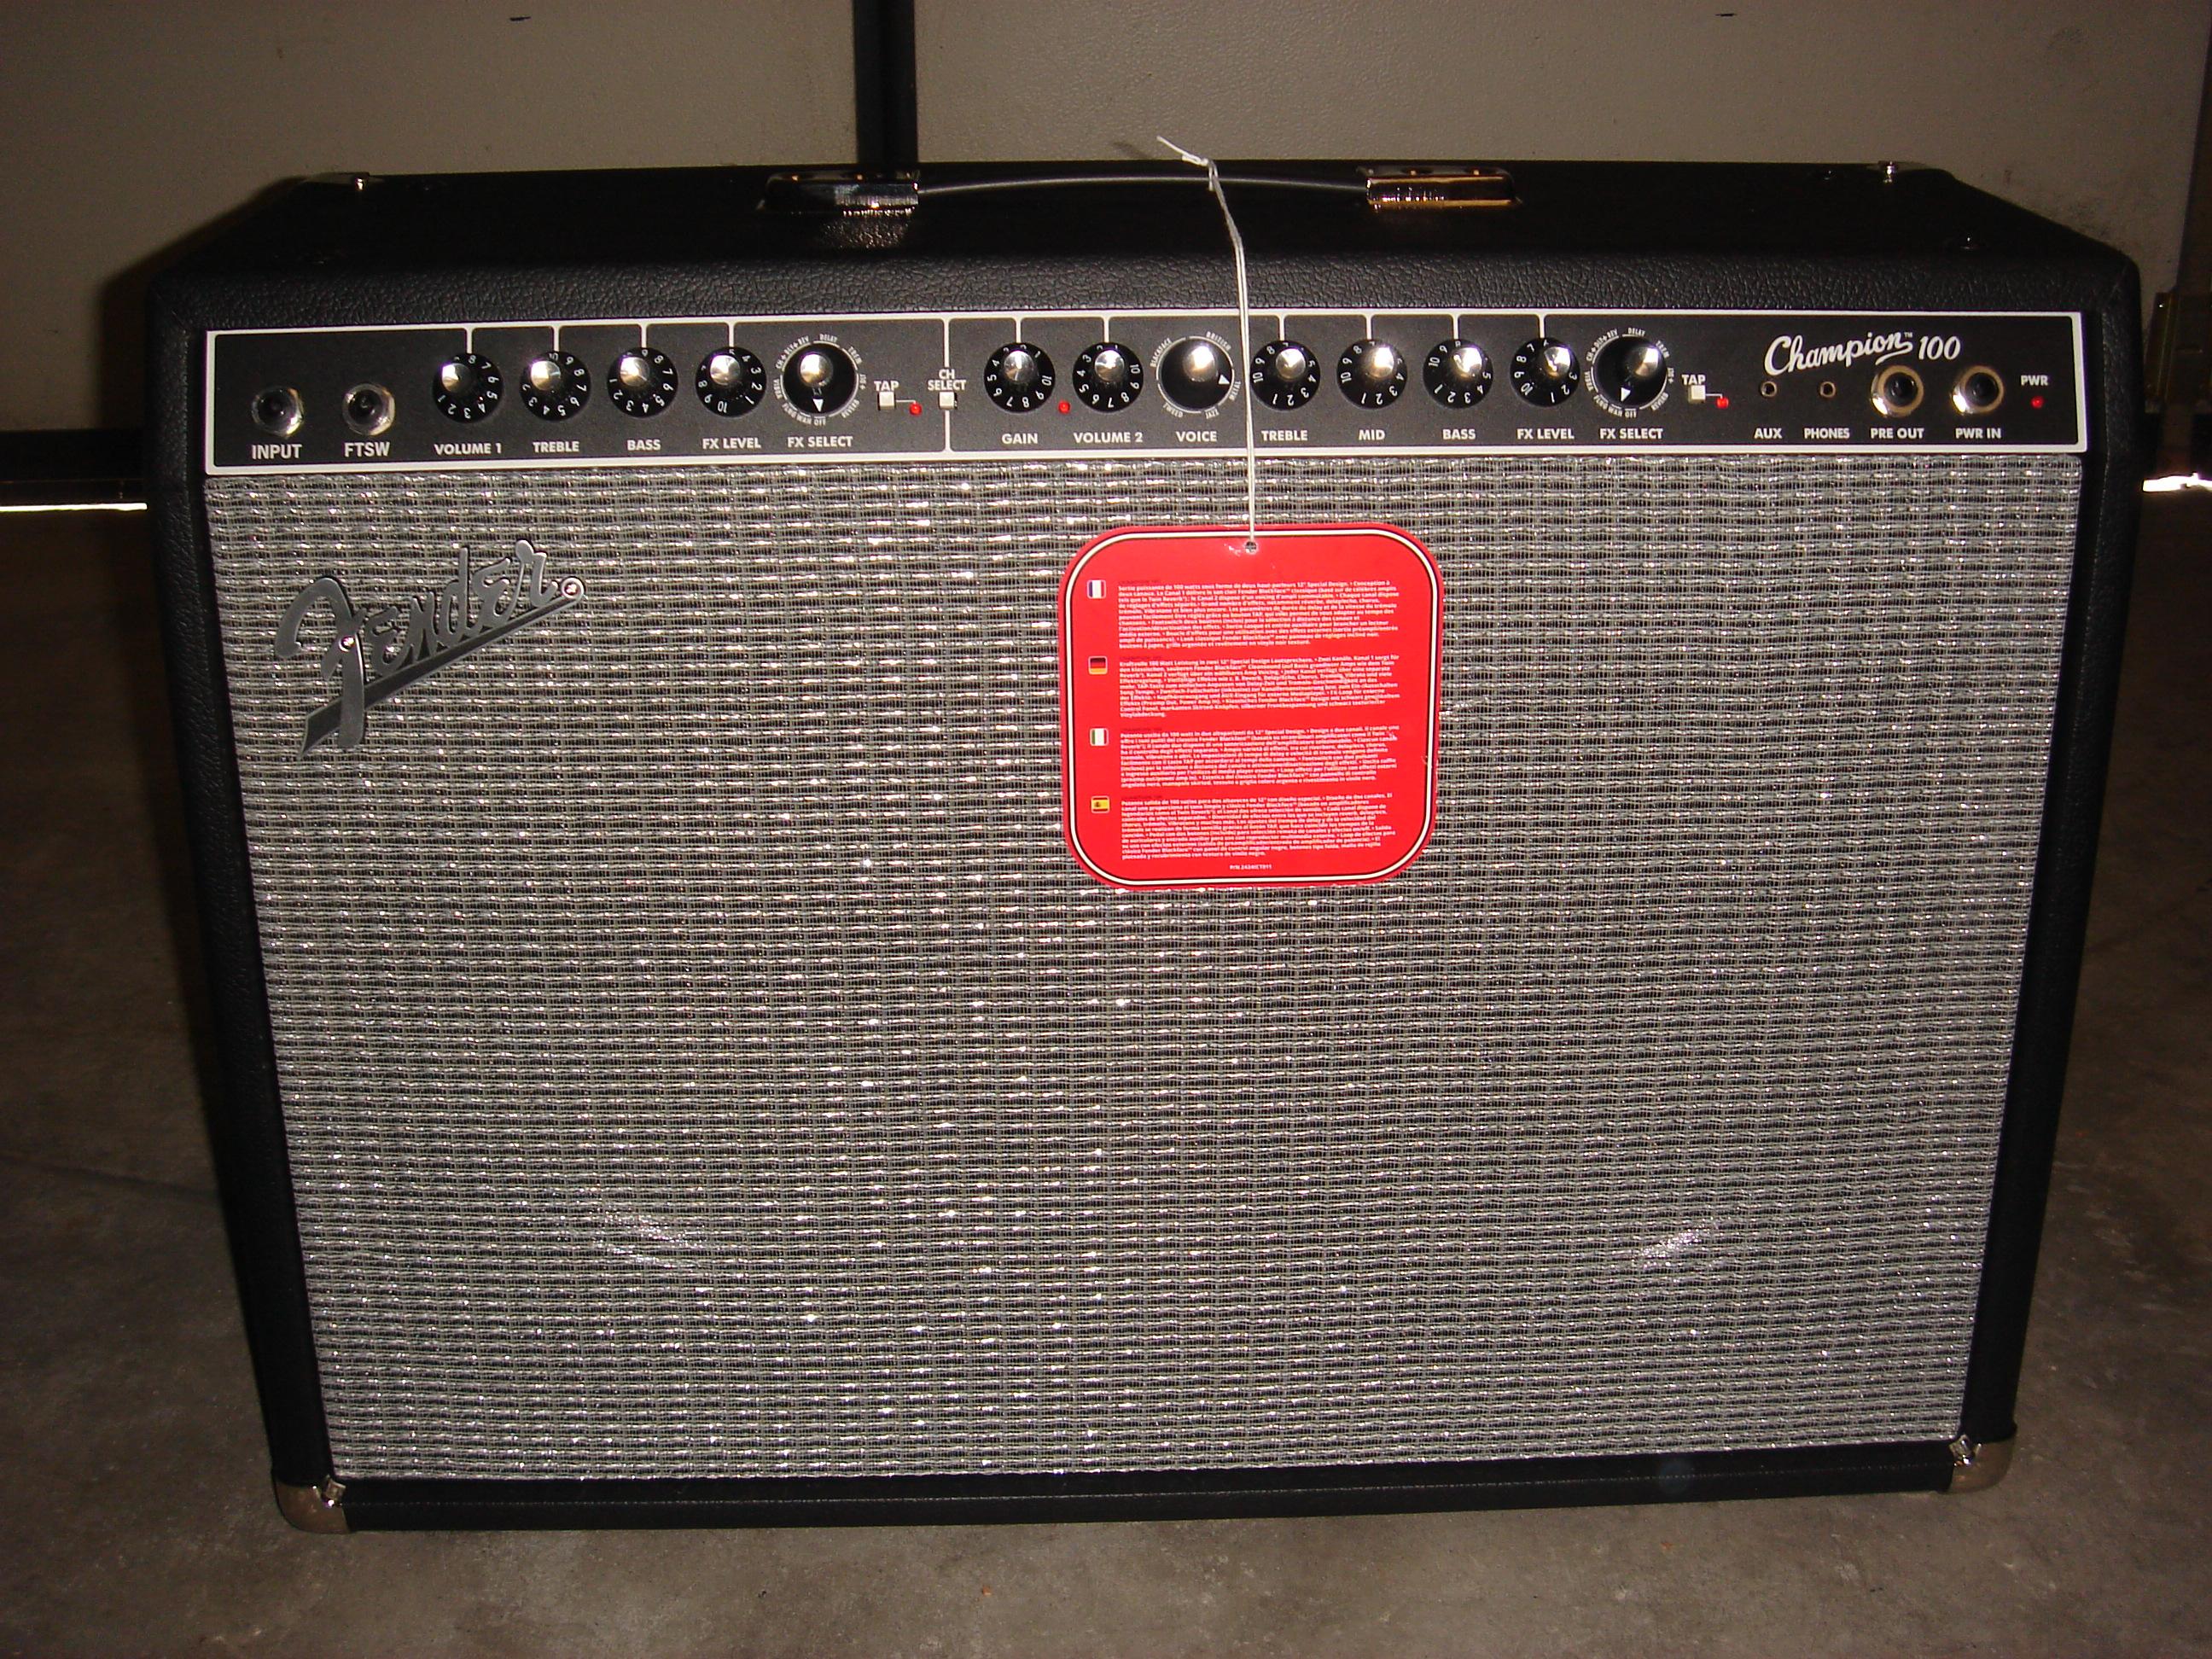 DNH d913a2x 31100708 3x Spugna Filtro per Hoover DNH d913a2c 31100787